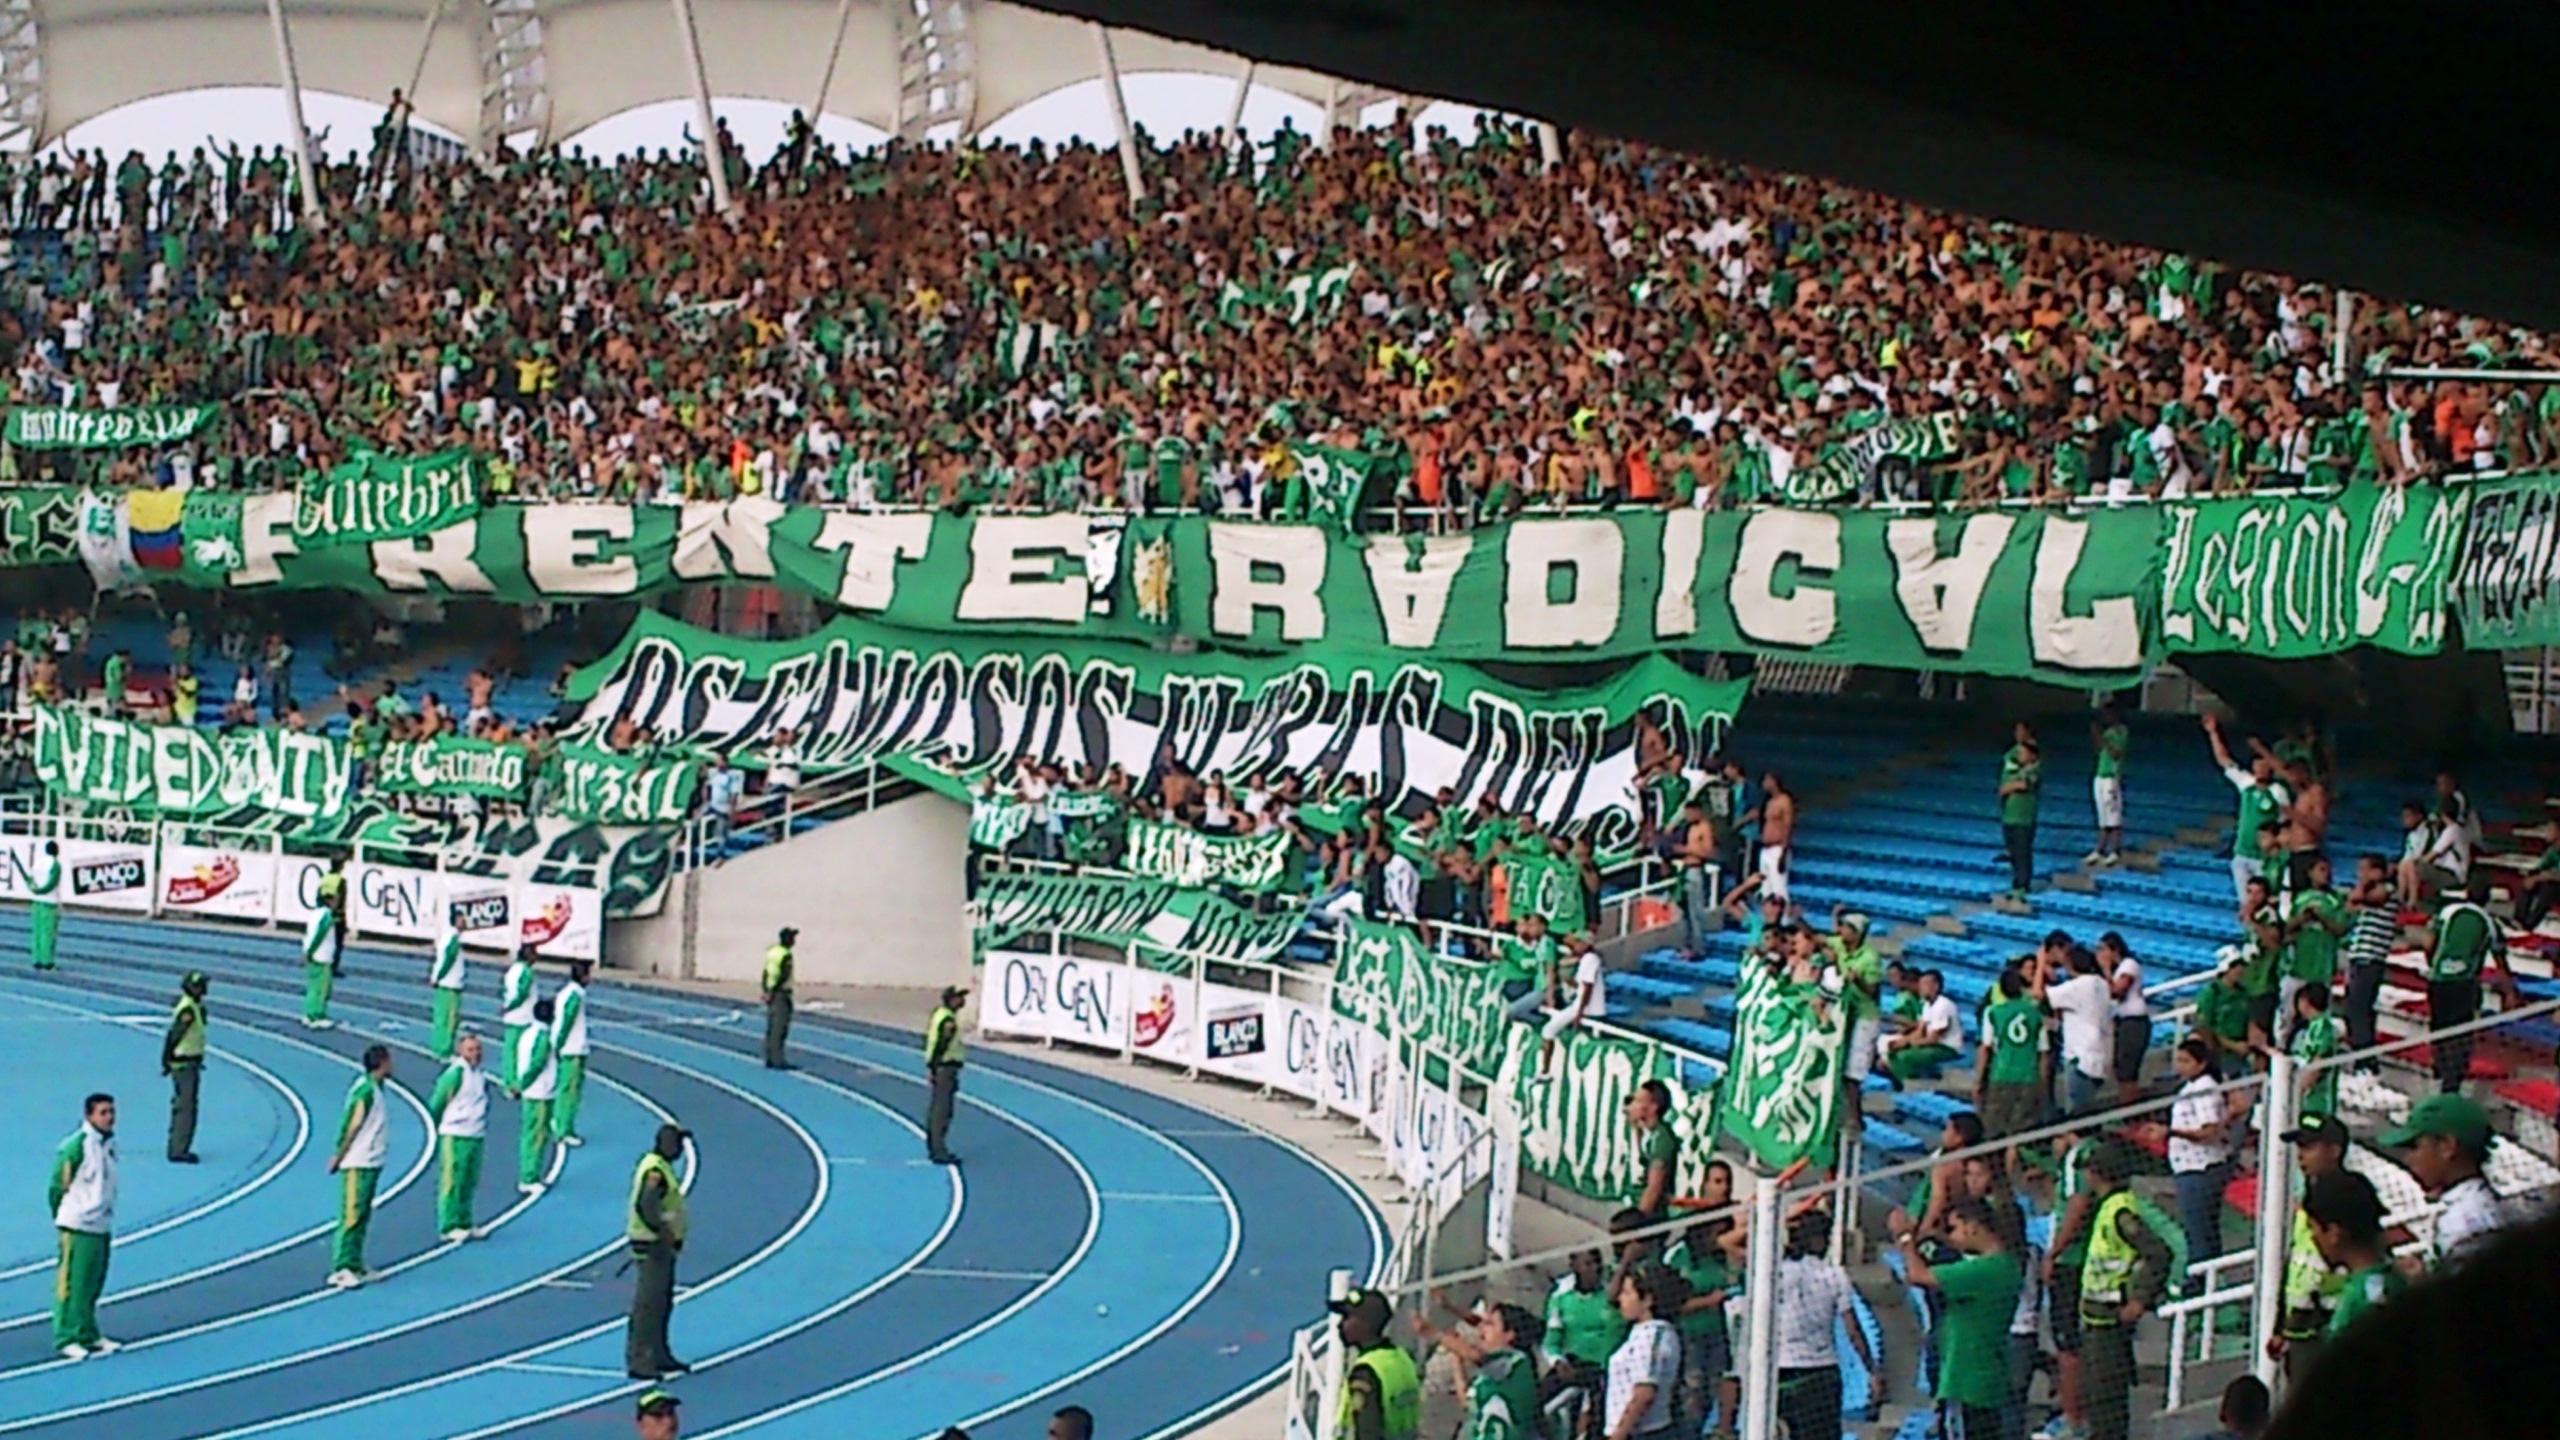 File Deportivo Cali Vs Quindio 2013 04 Jpg Wikimedia Commons